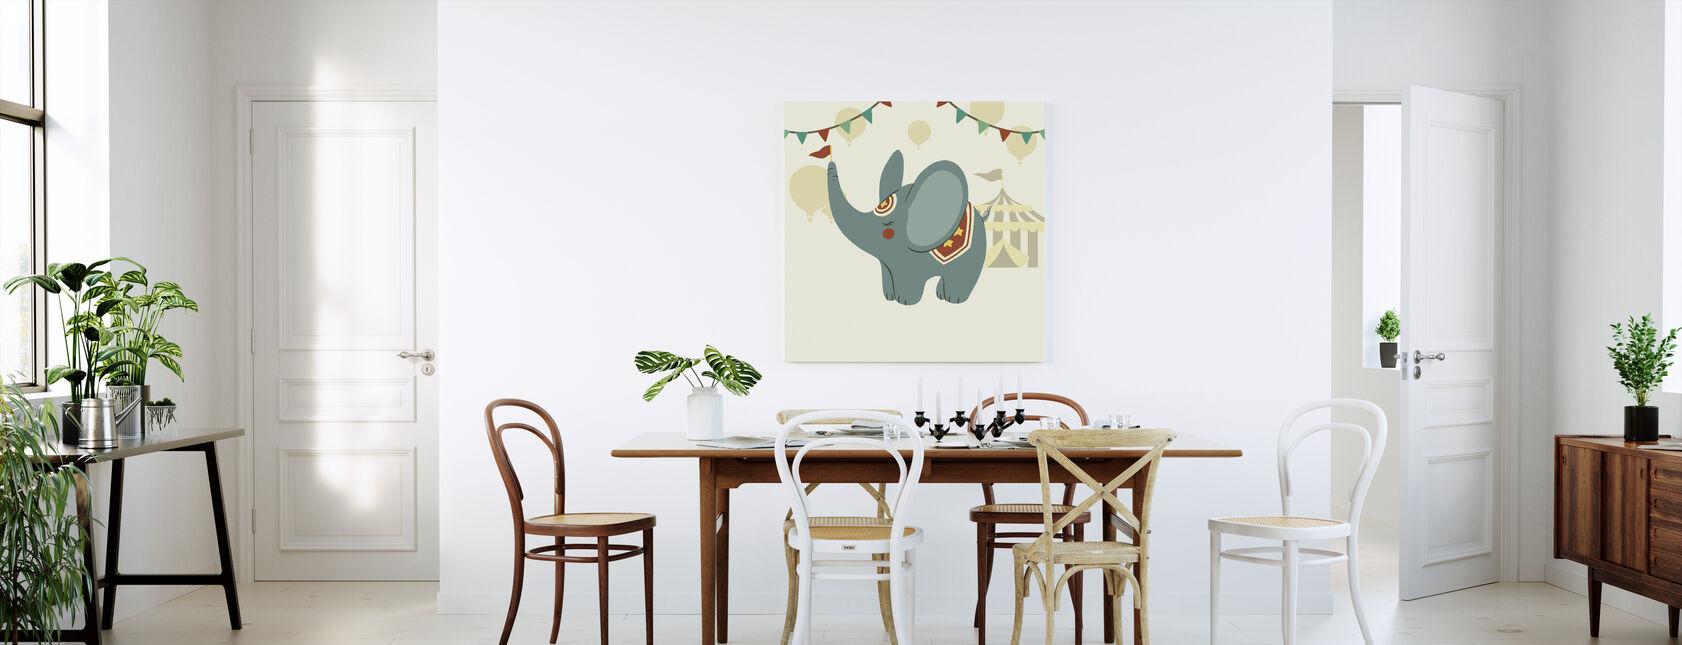 Little Circus Elephant - Canvas print - Kitchen